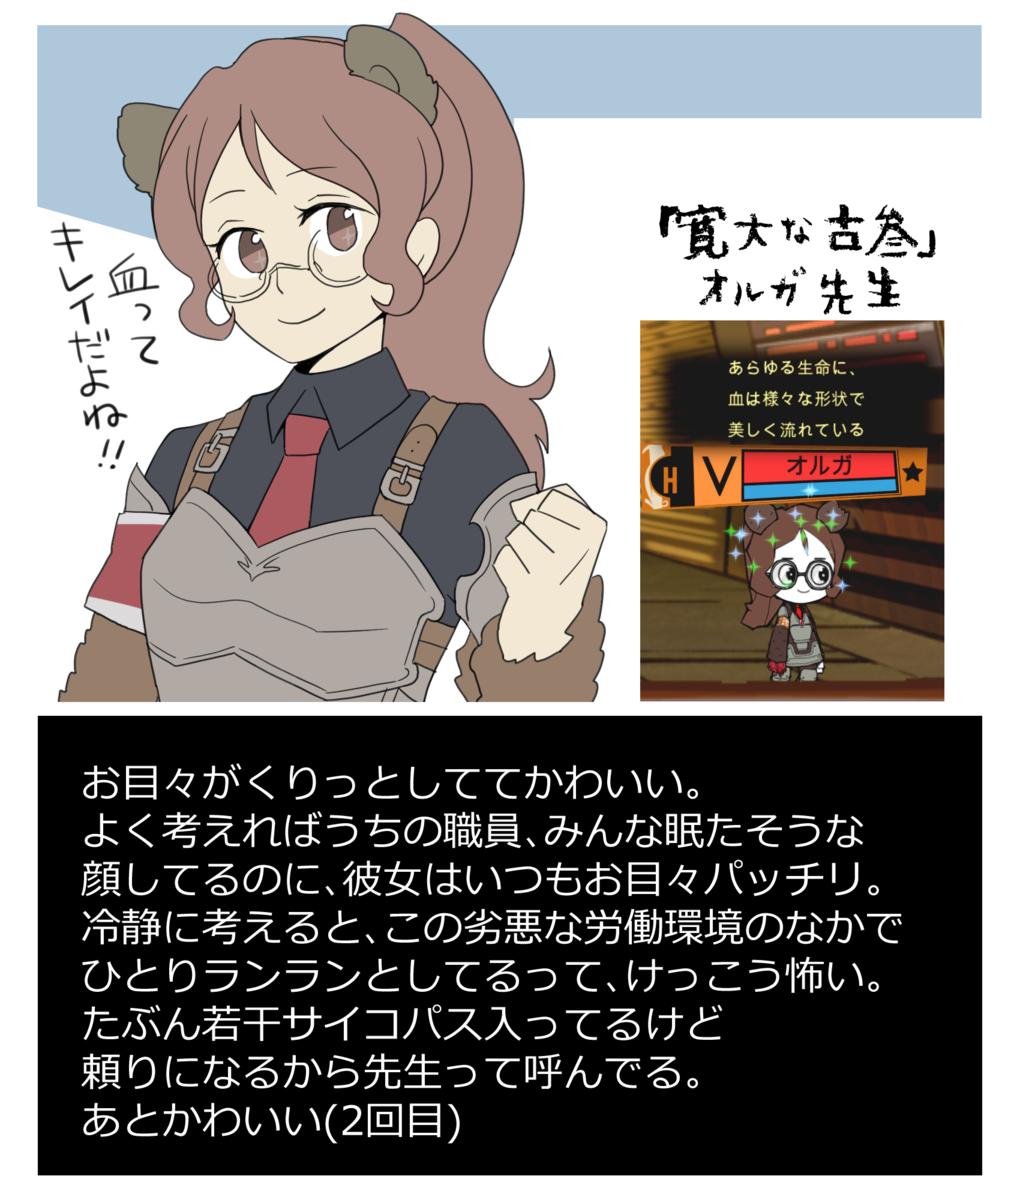 f:id:nantekotodesyoune_segawa:20190515140118p:plain